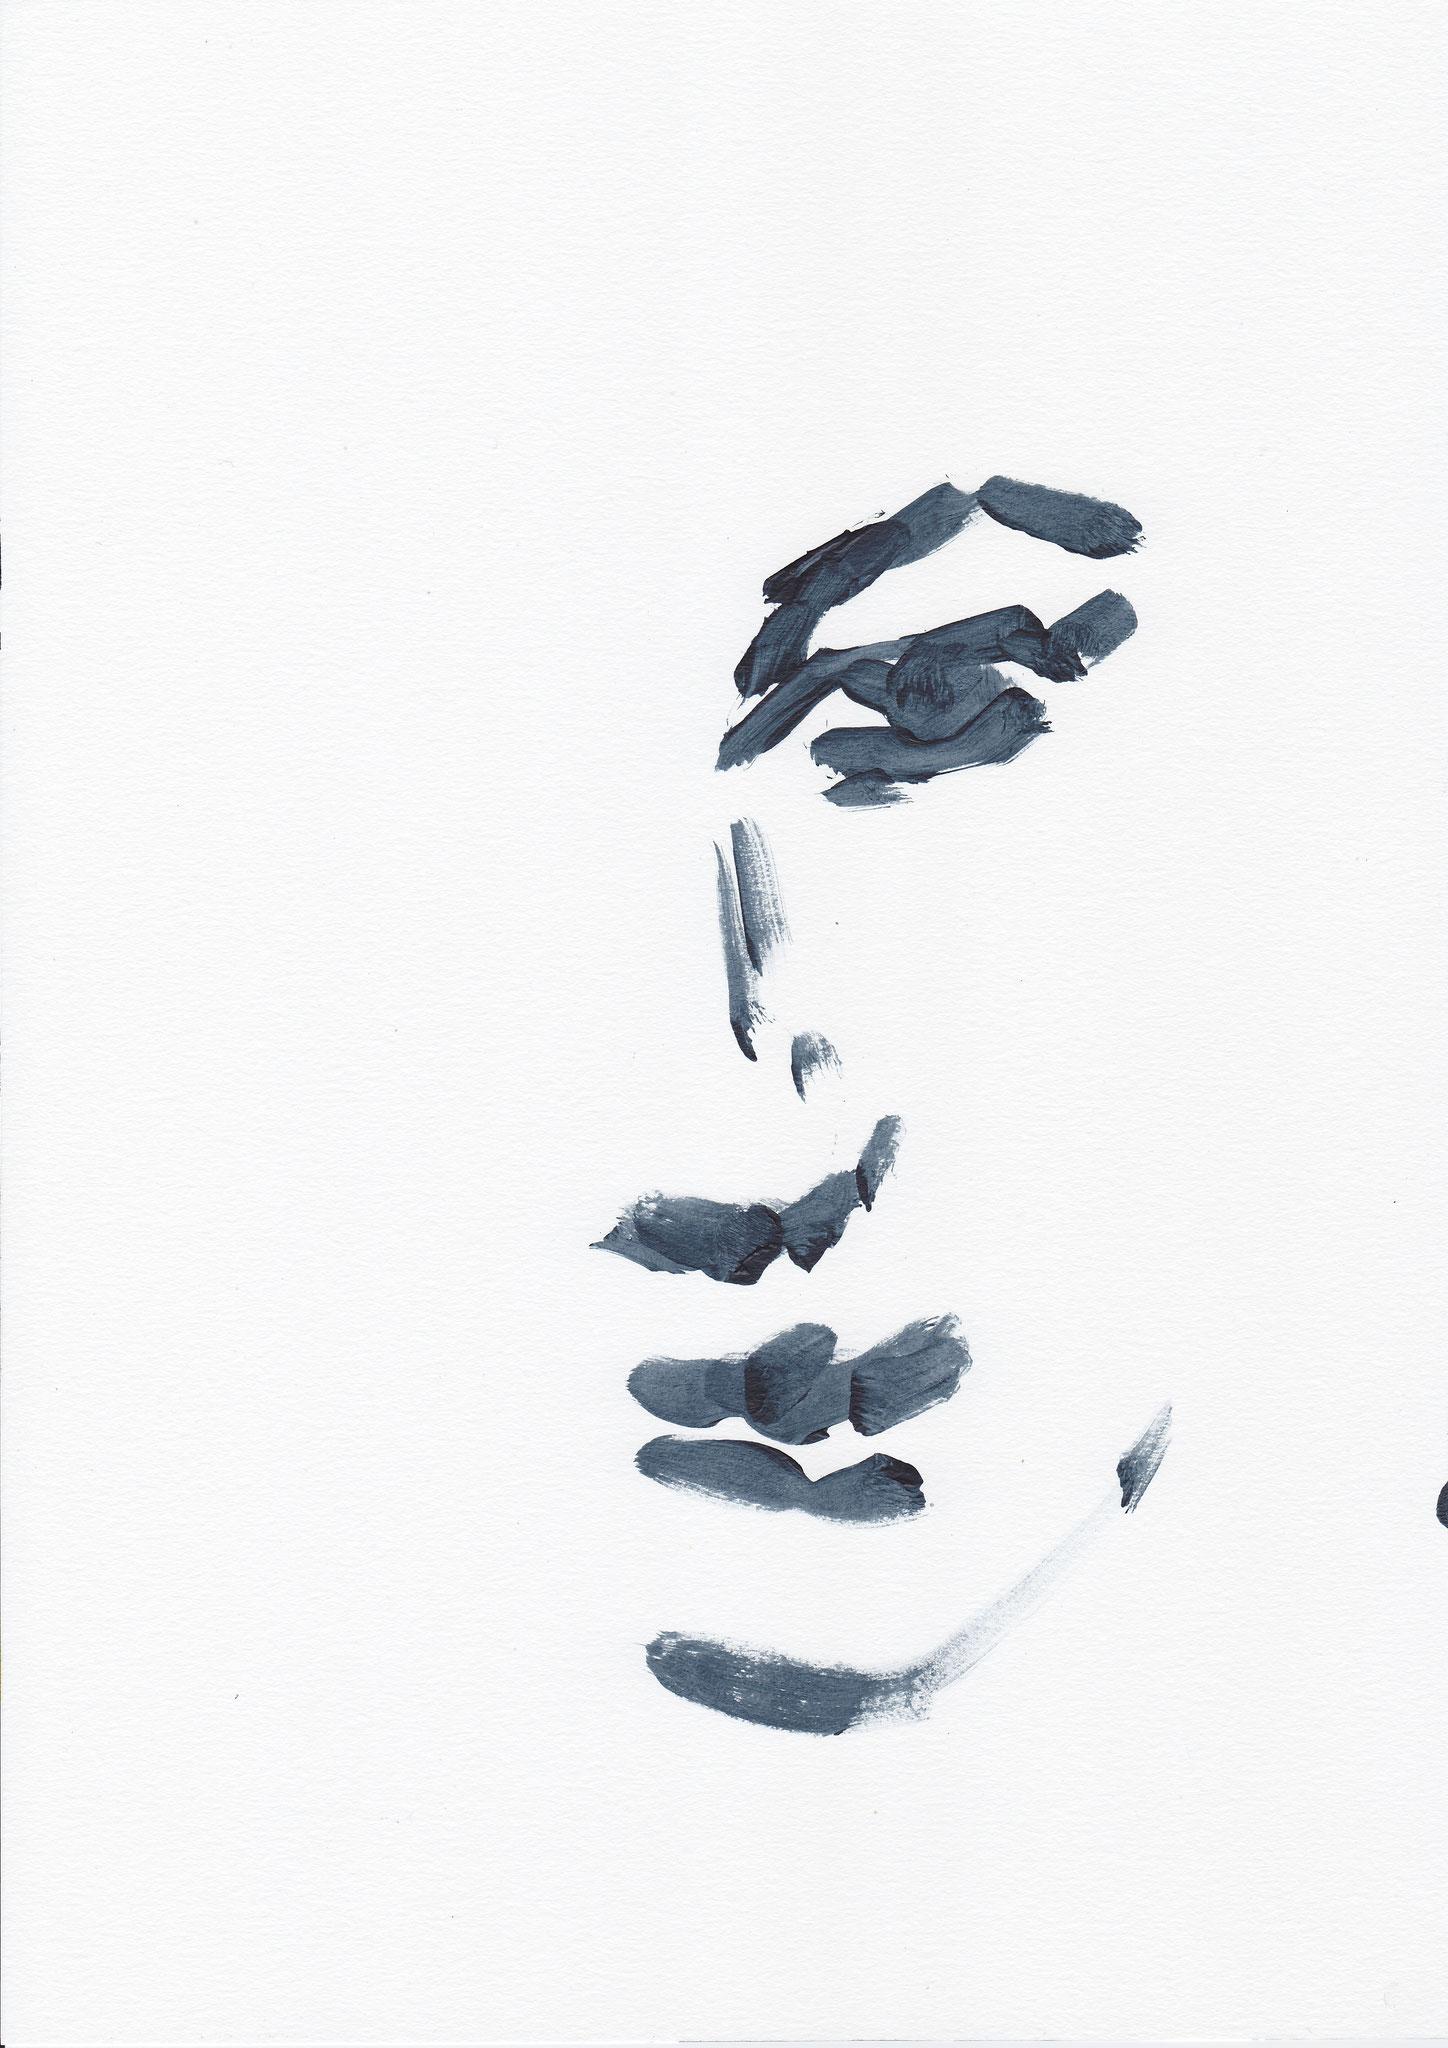 021 , acrylic on paper , 29.7 x 21cm , Selina Saranova